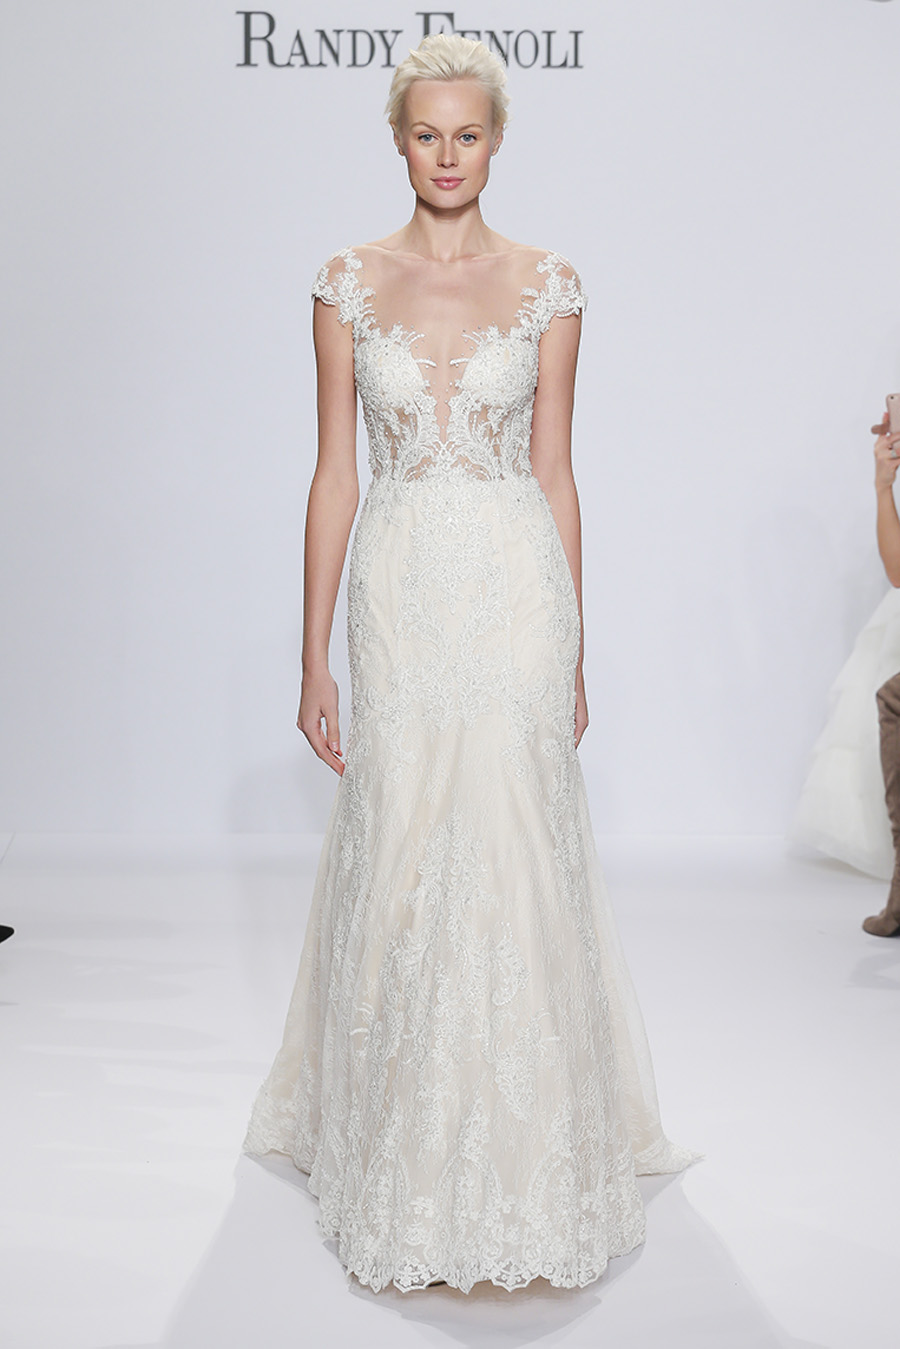 Randy Fenoli Bridal Collection gown 5